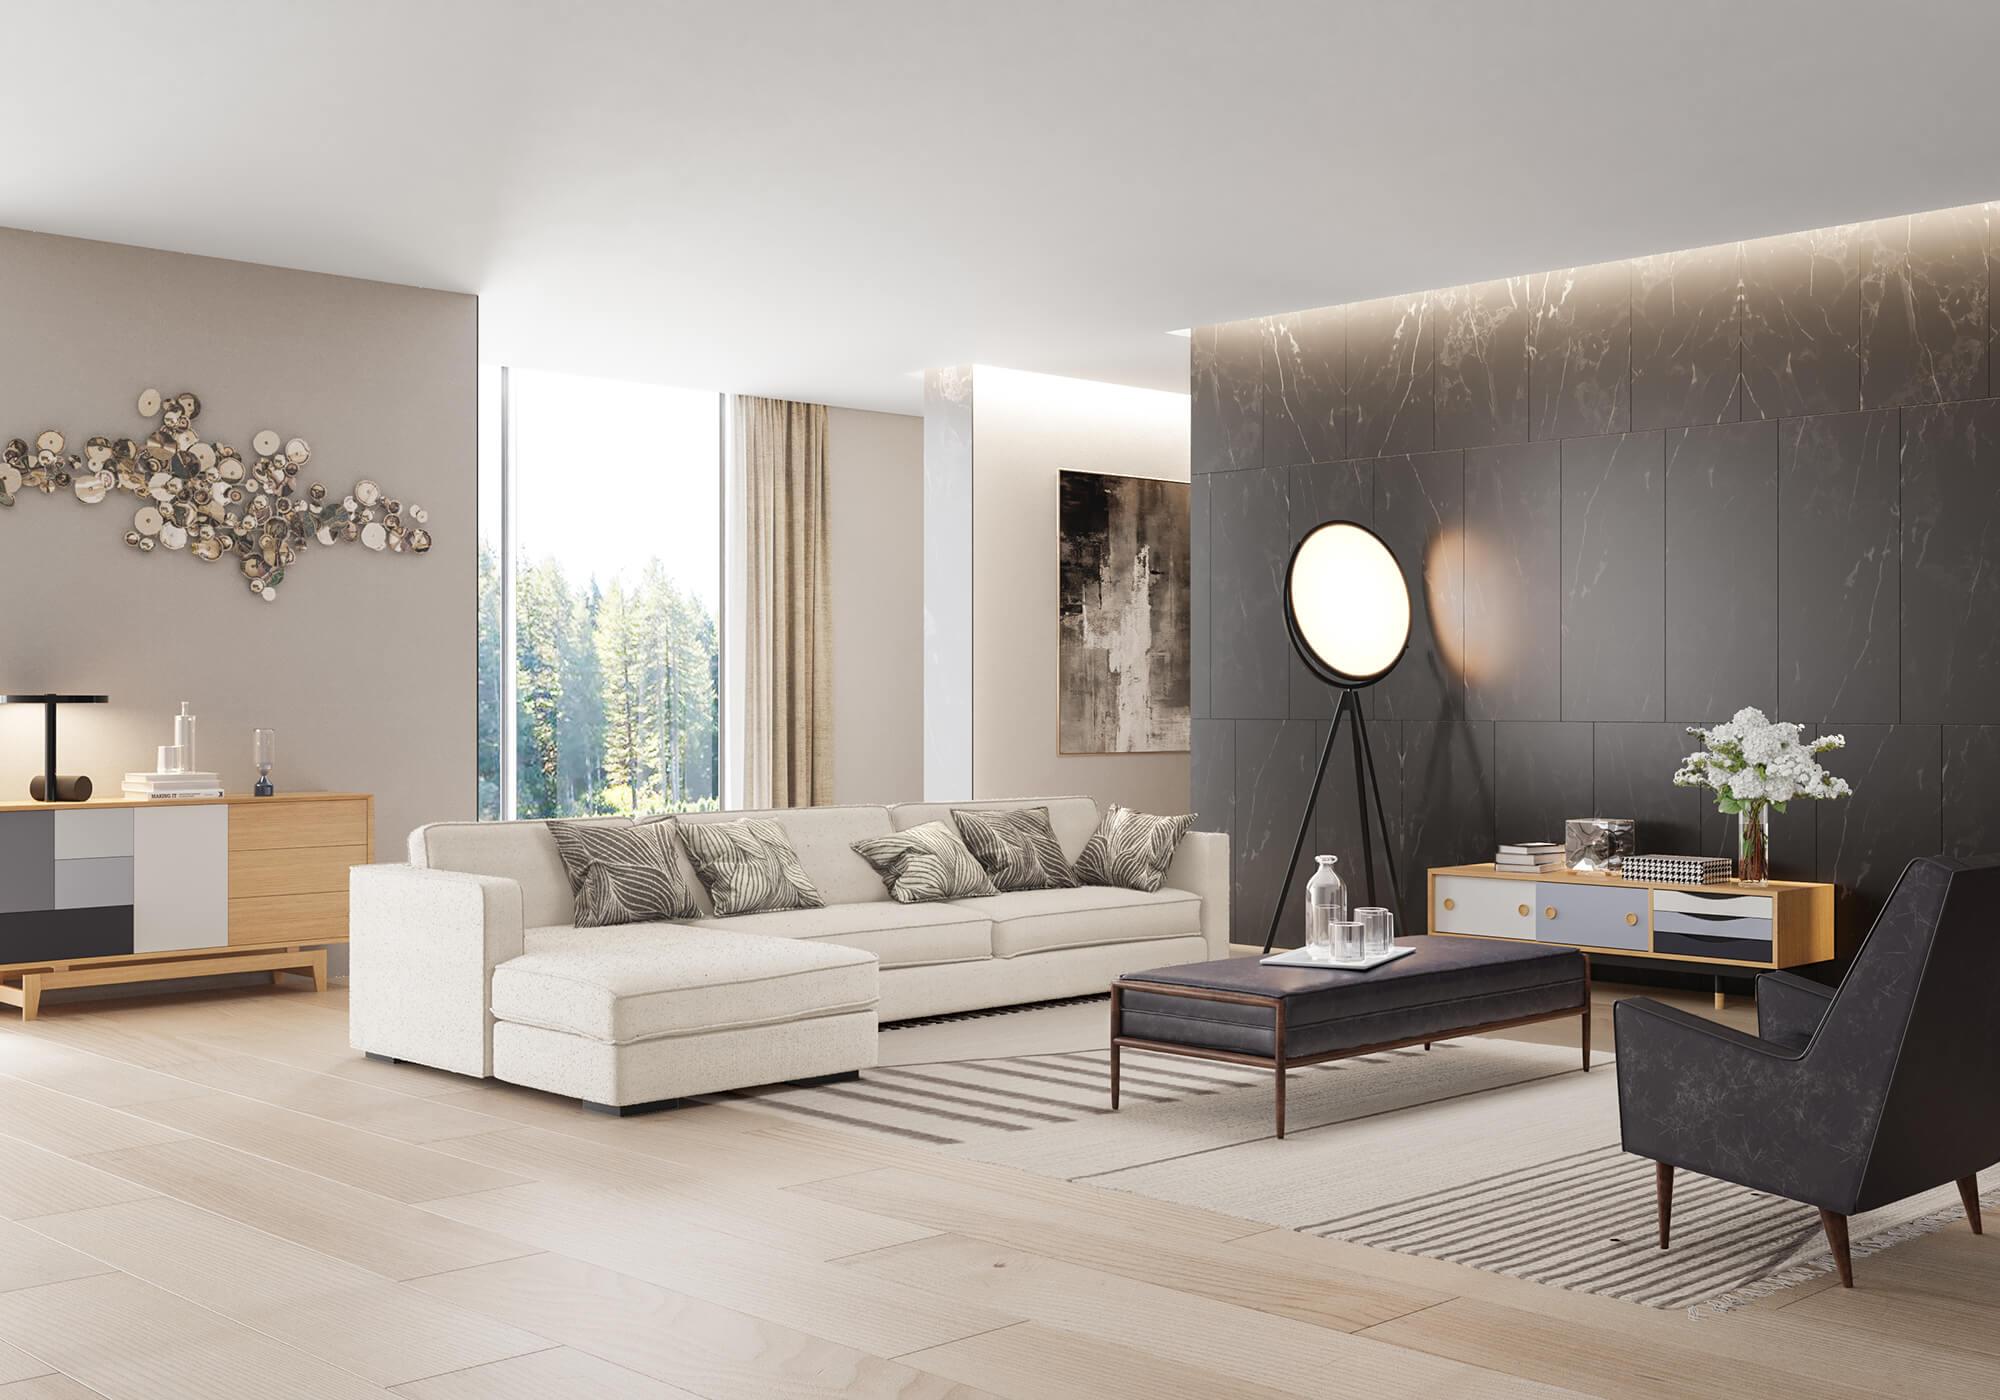 Krisel1 Fritz Platform Theory Mid Century Modern Sofa